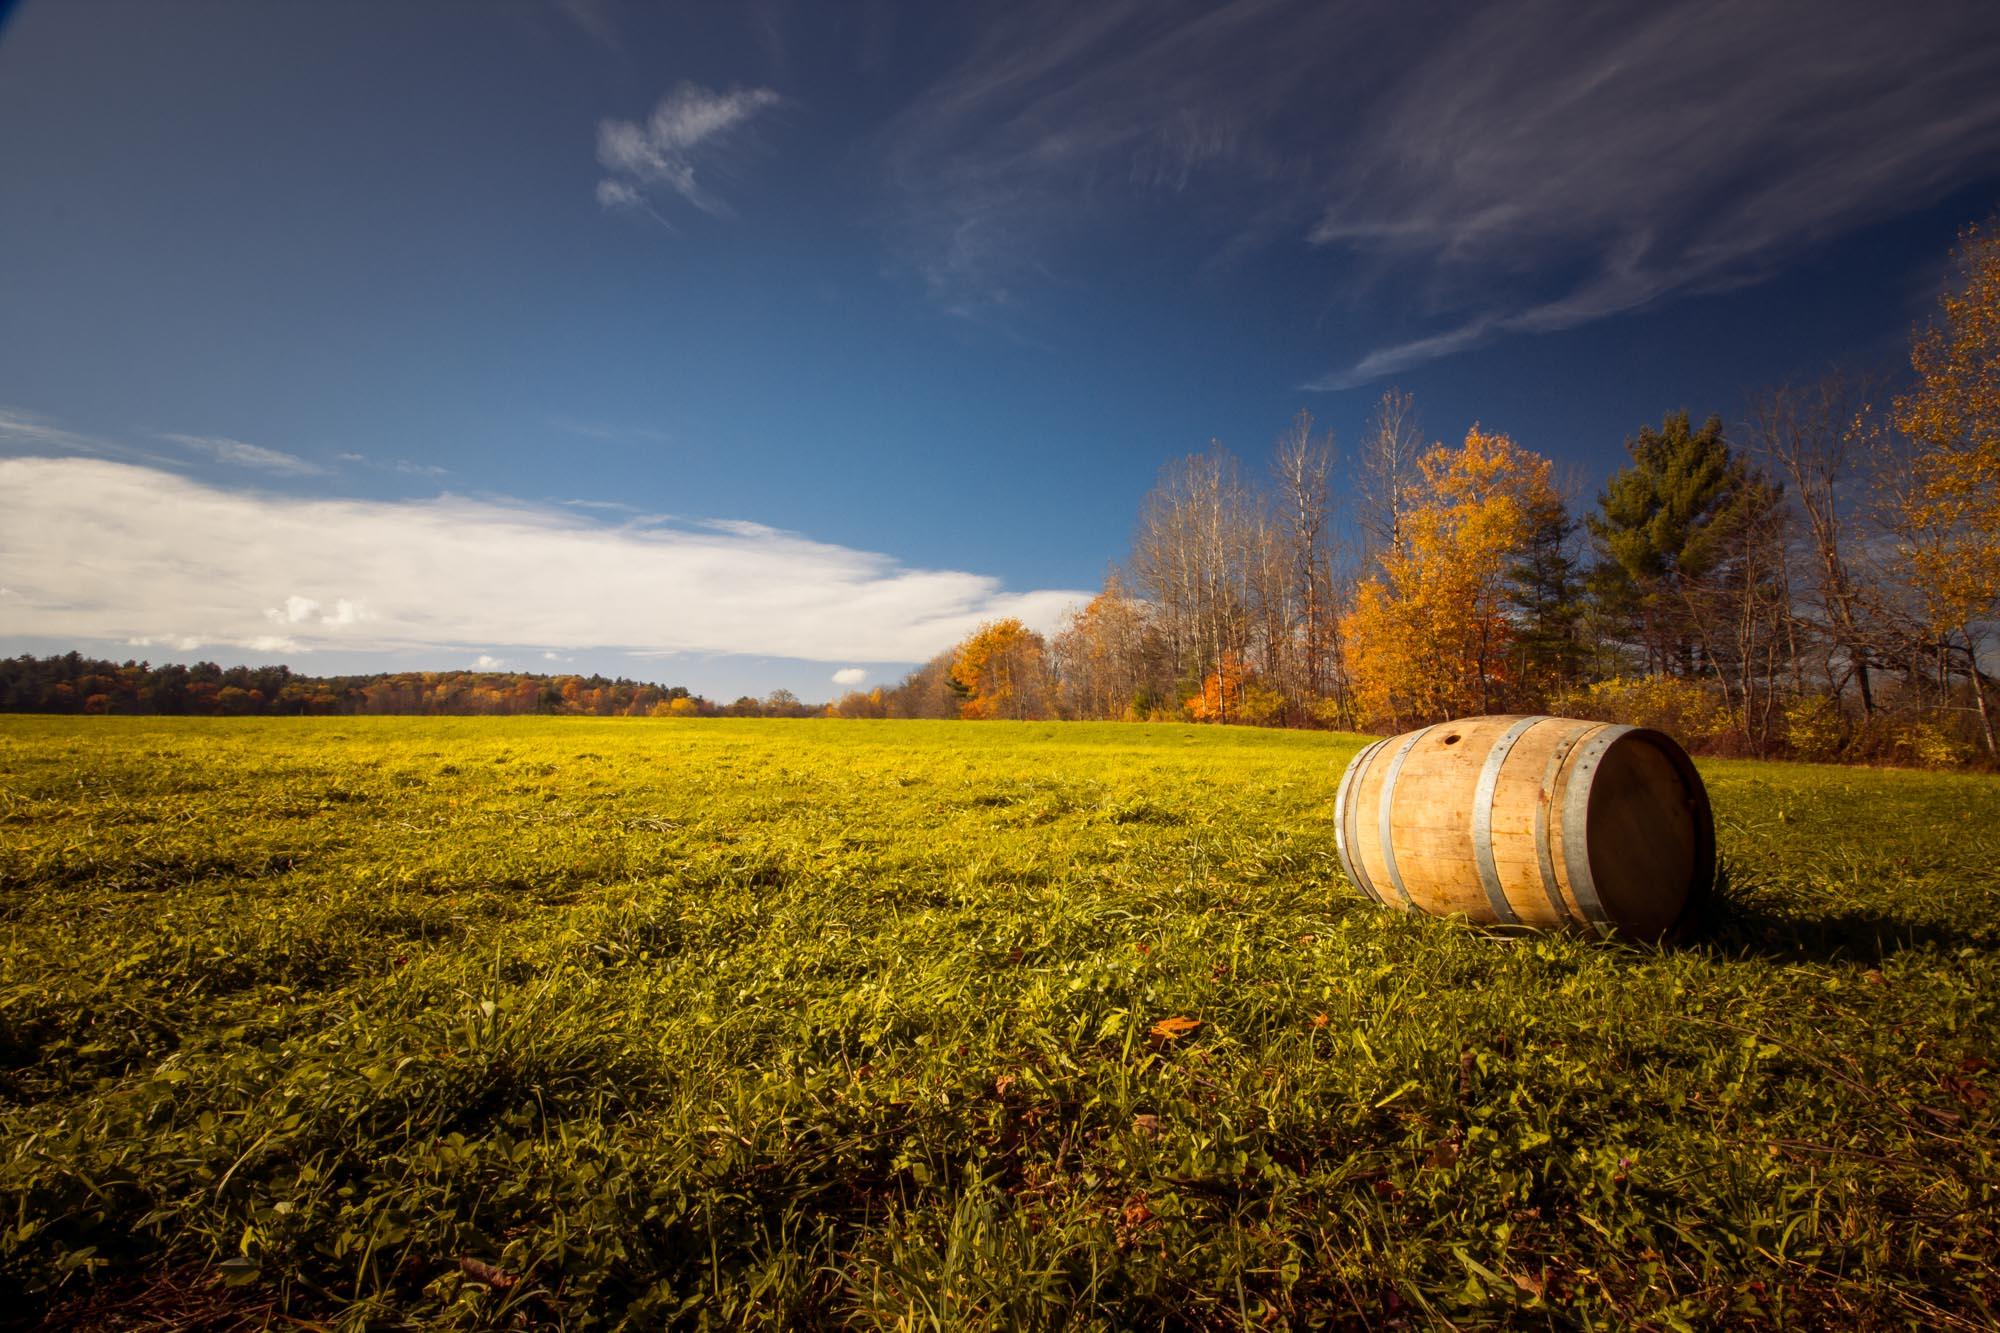 Willows Awake - Winery & Vineyard